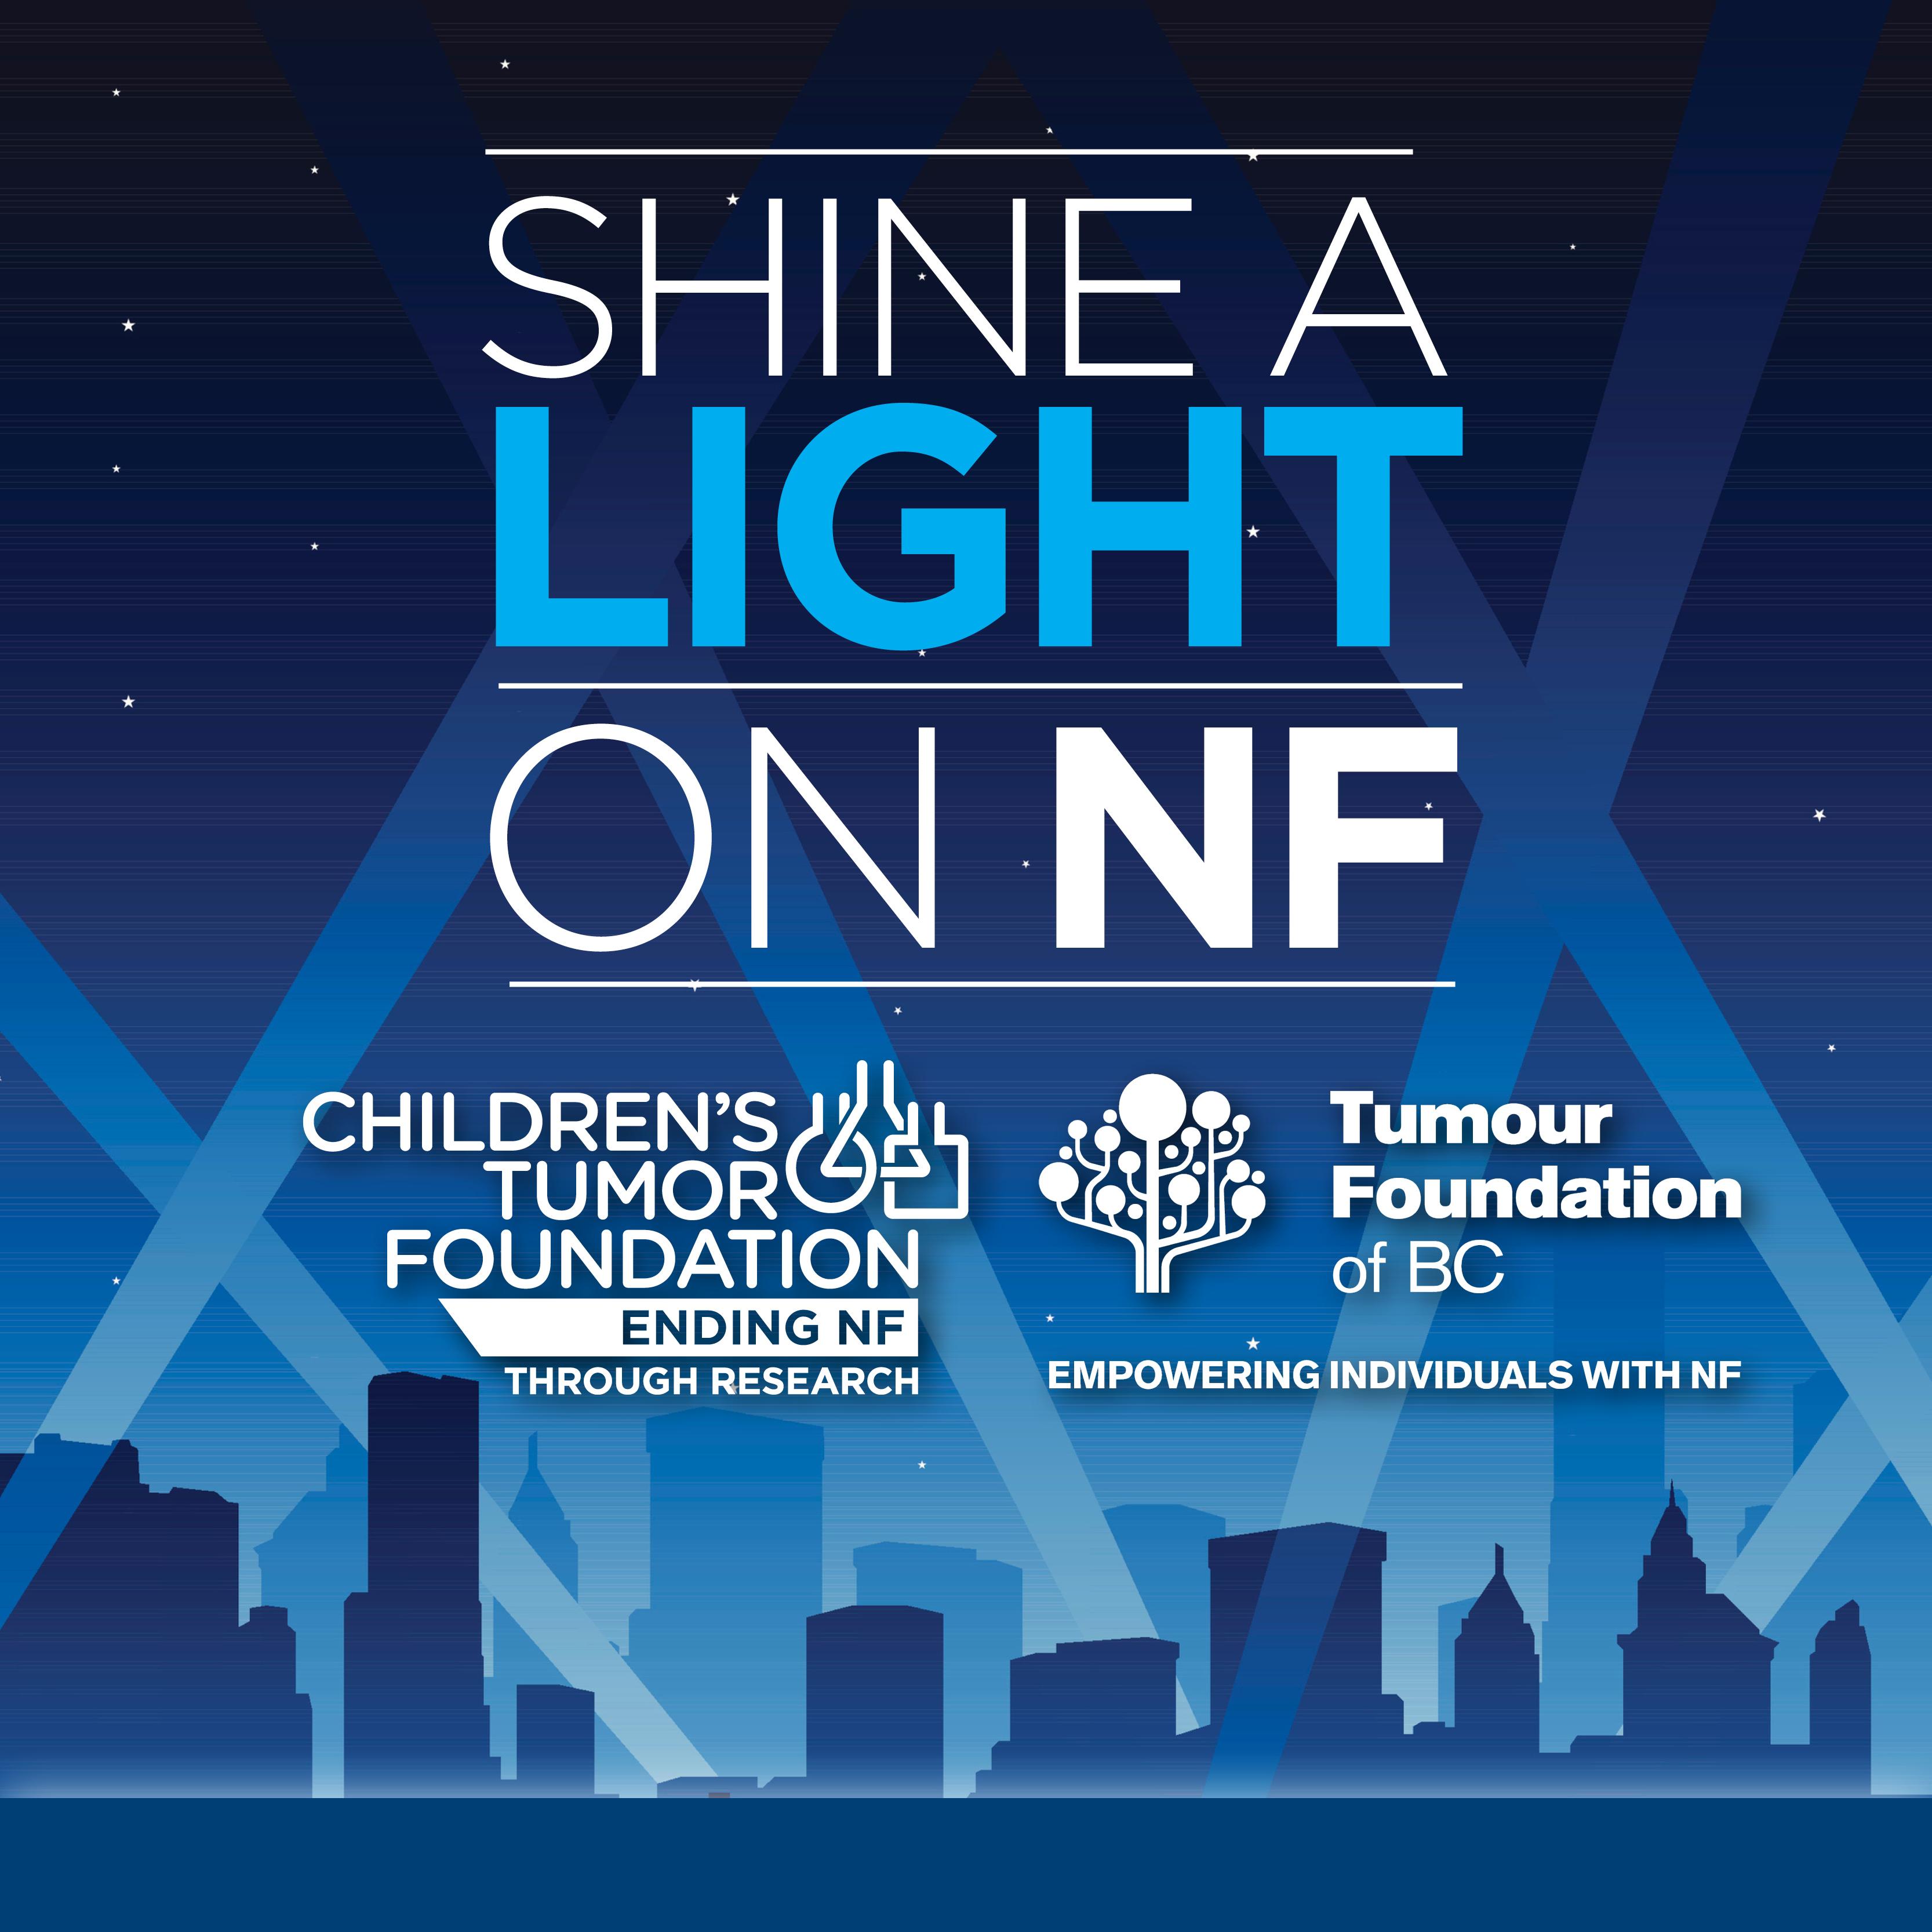 Shine a Light 2018 - Tumour Foundation of BC